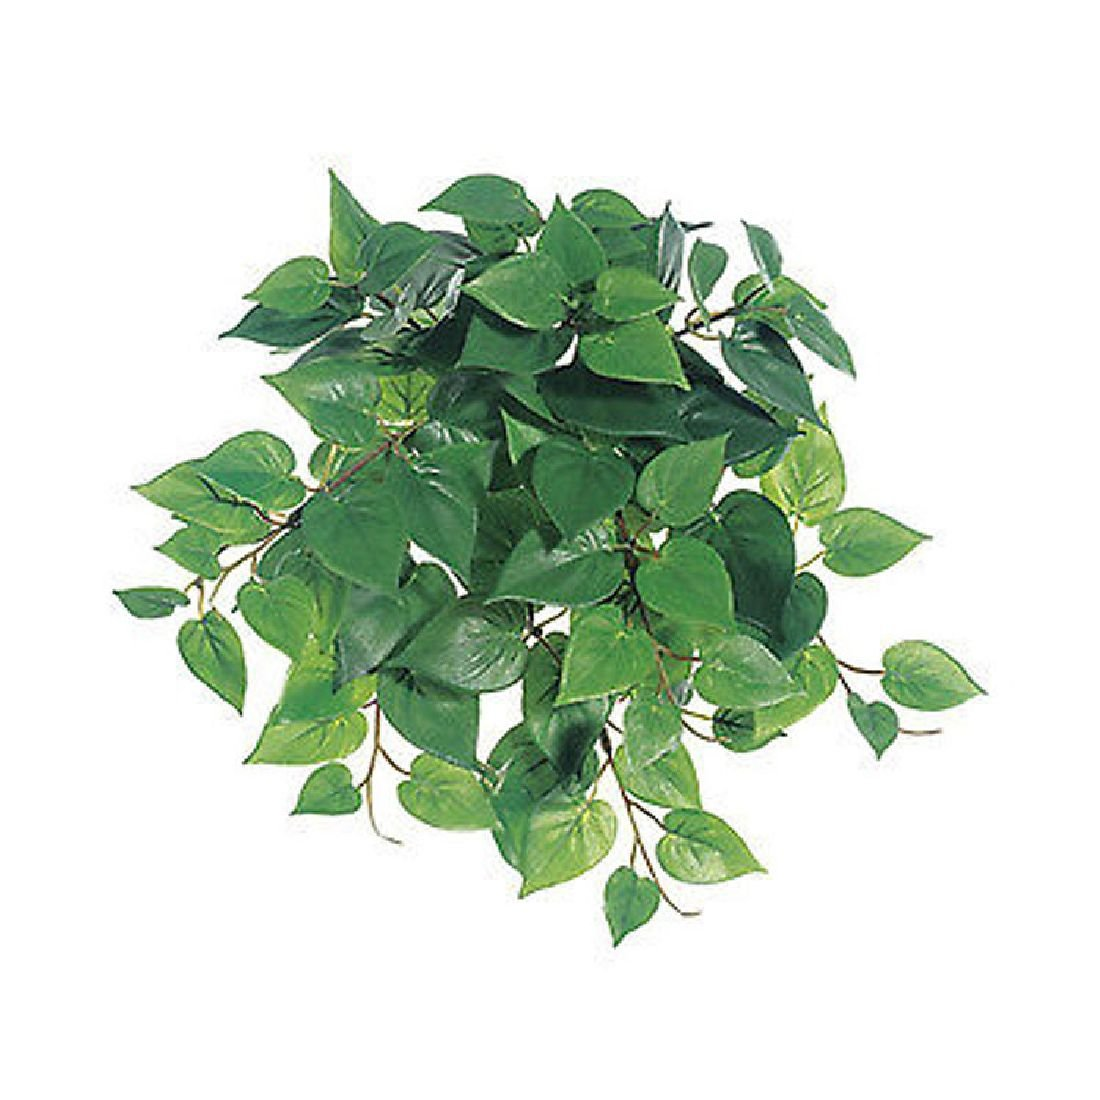 Philodendron Bush Mini greeneryシルクウェディング花センターピース装飾 B0744HCDSZ